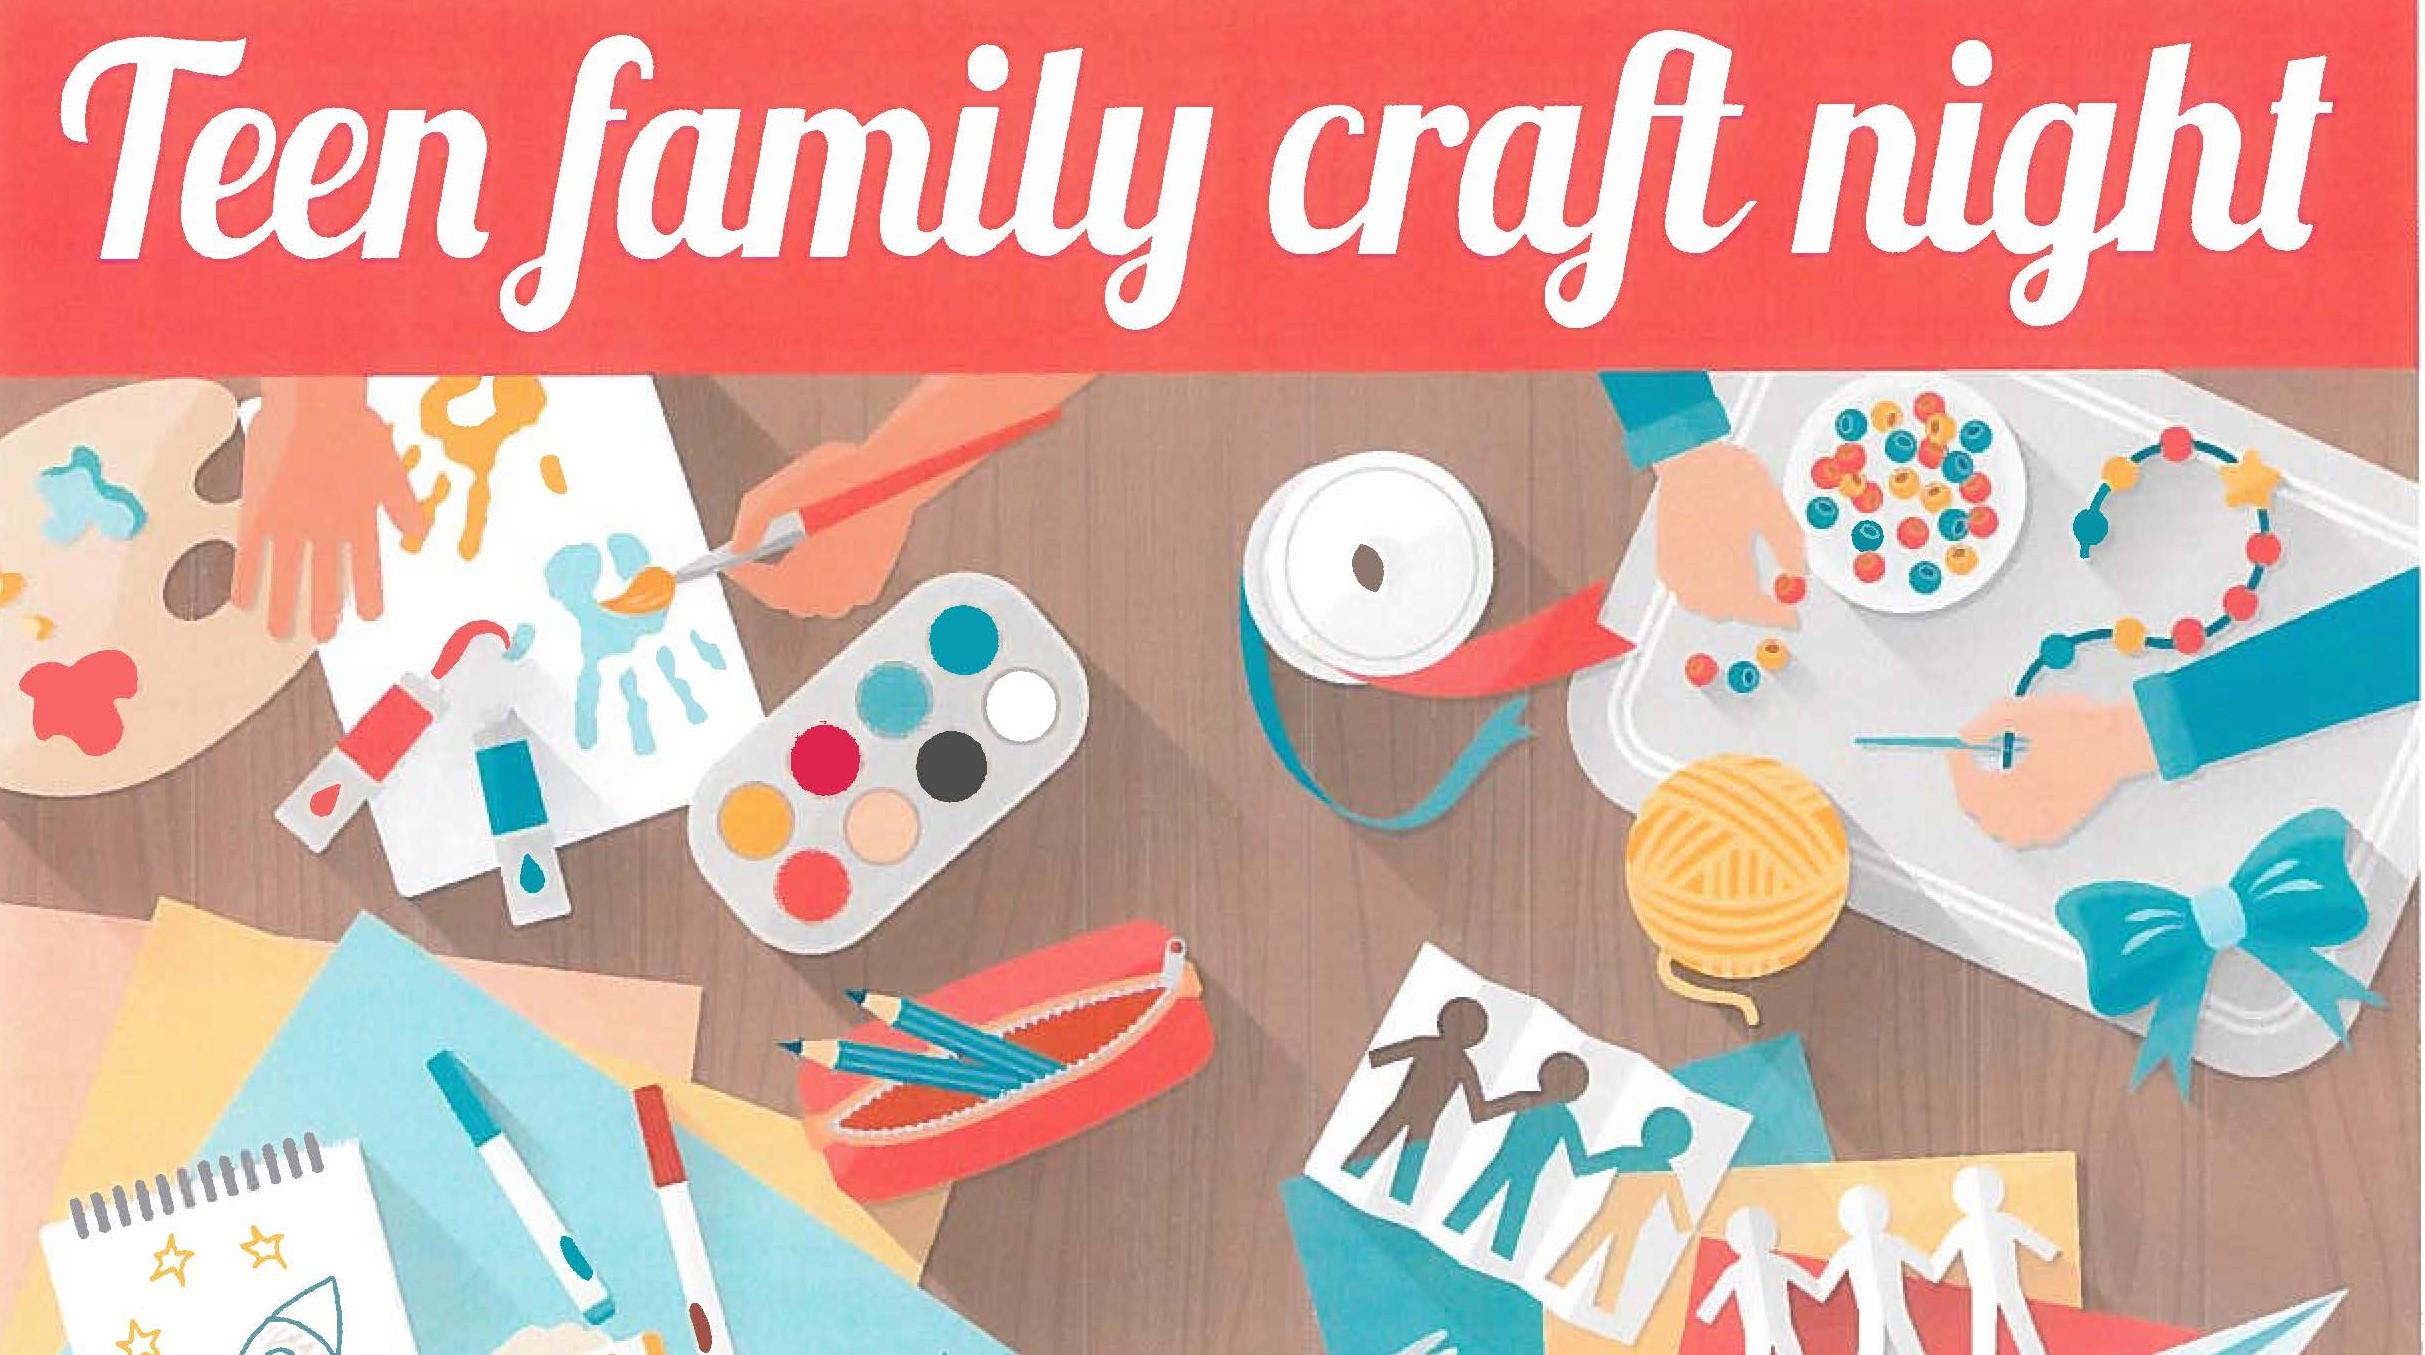 Teen Family Craft Night